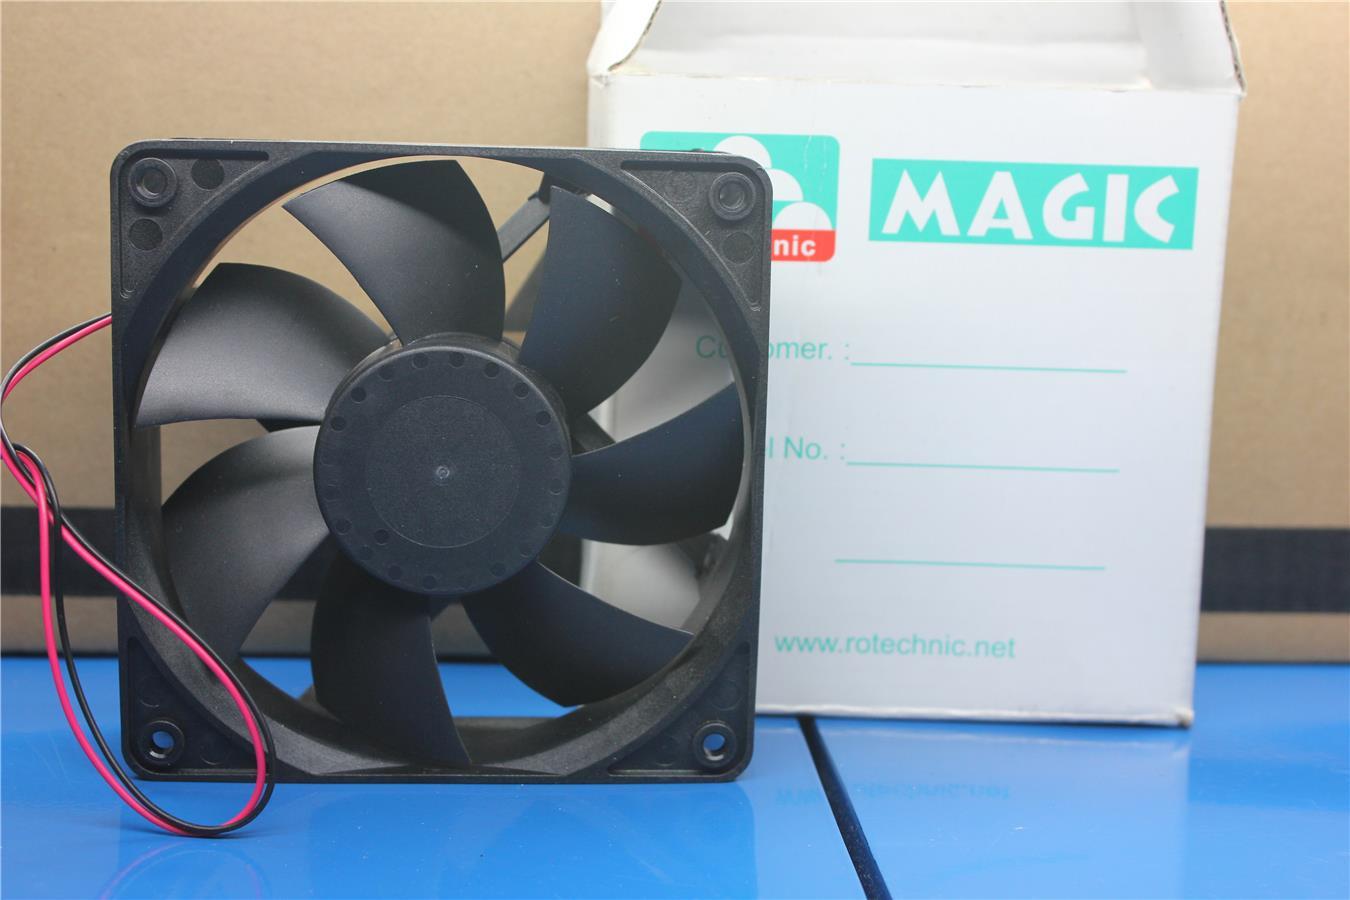 Magic MGA12024XB R-O38 24V 0.34A inverter chassis small fan